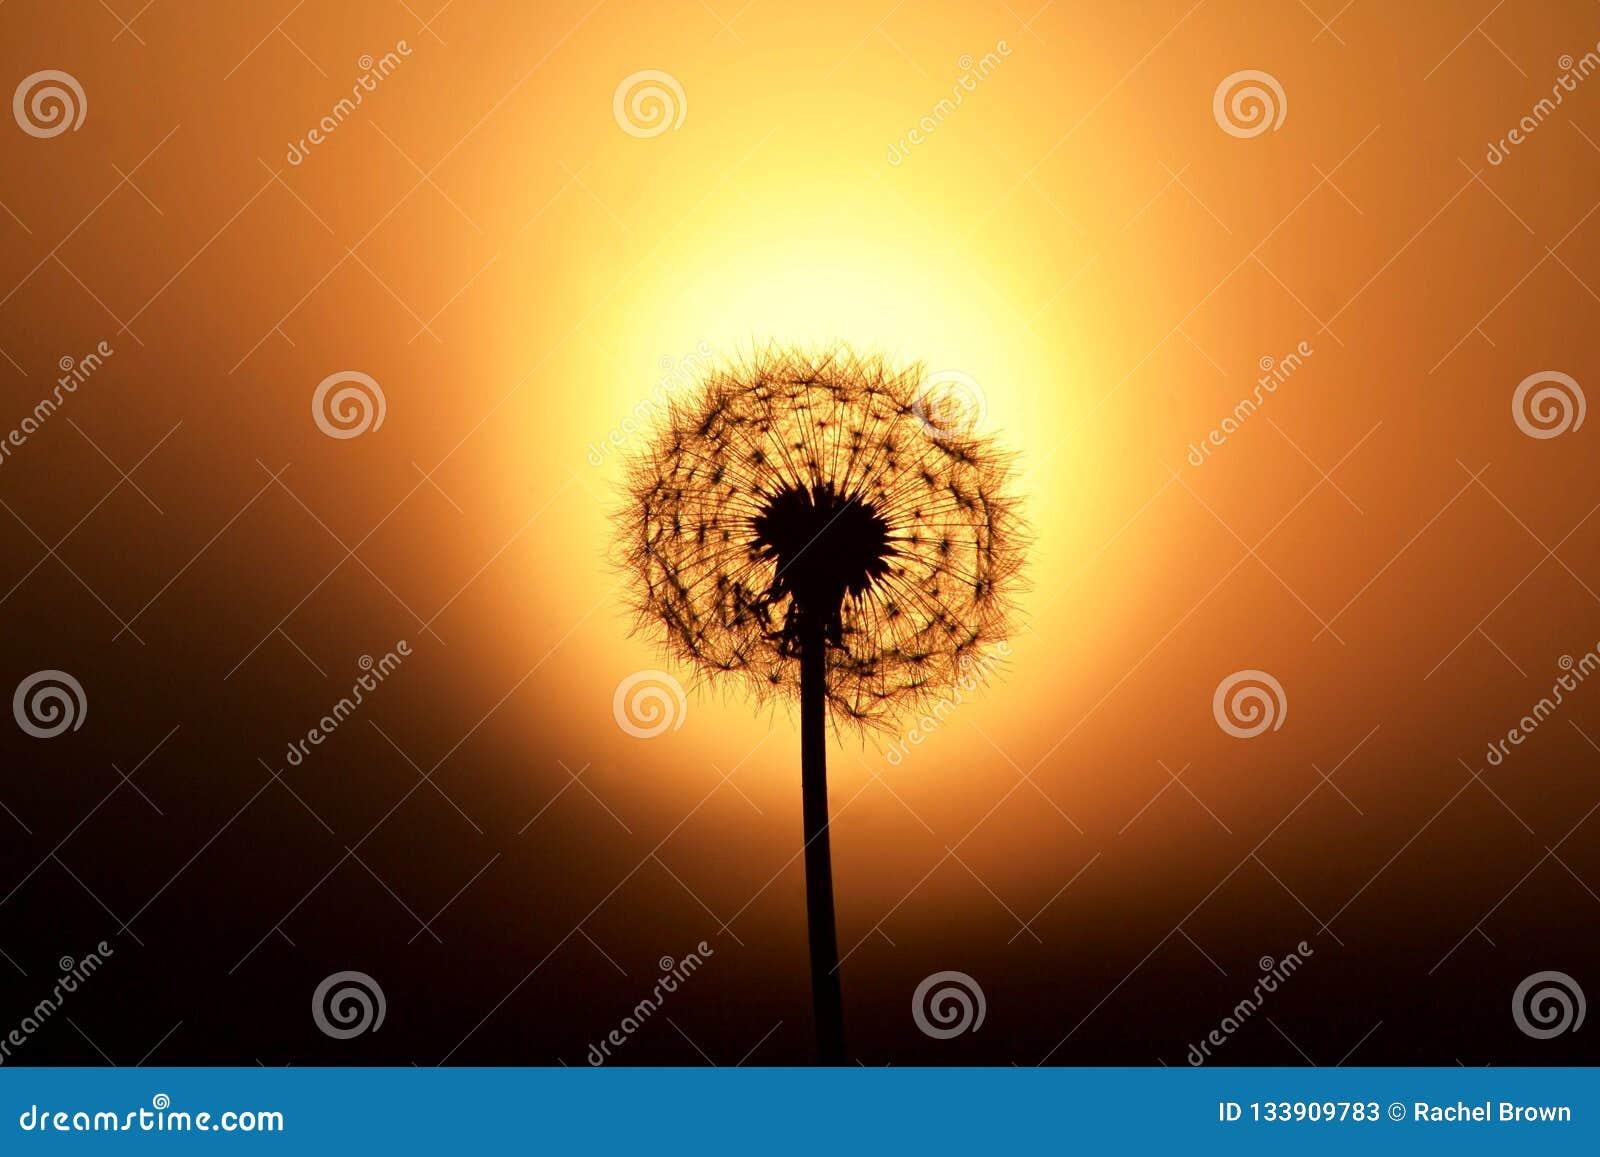 Dandelion silhouette against a sunset